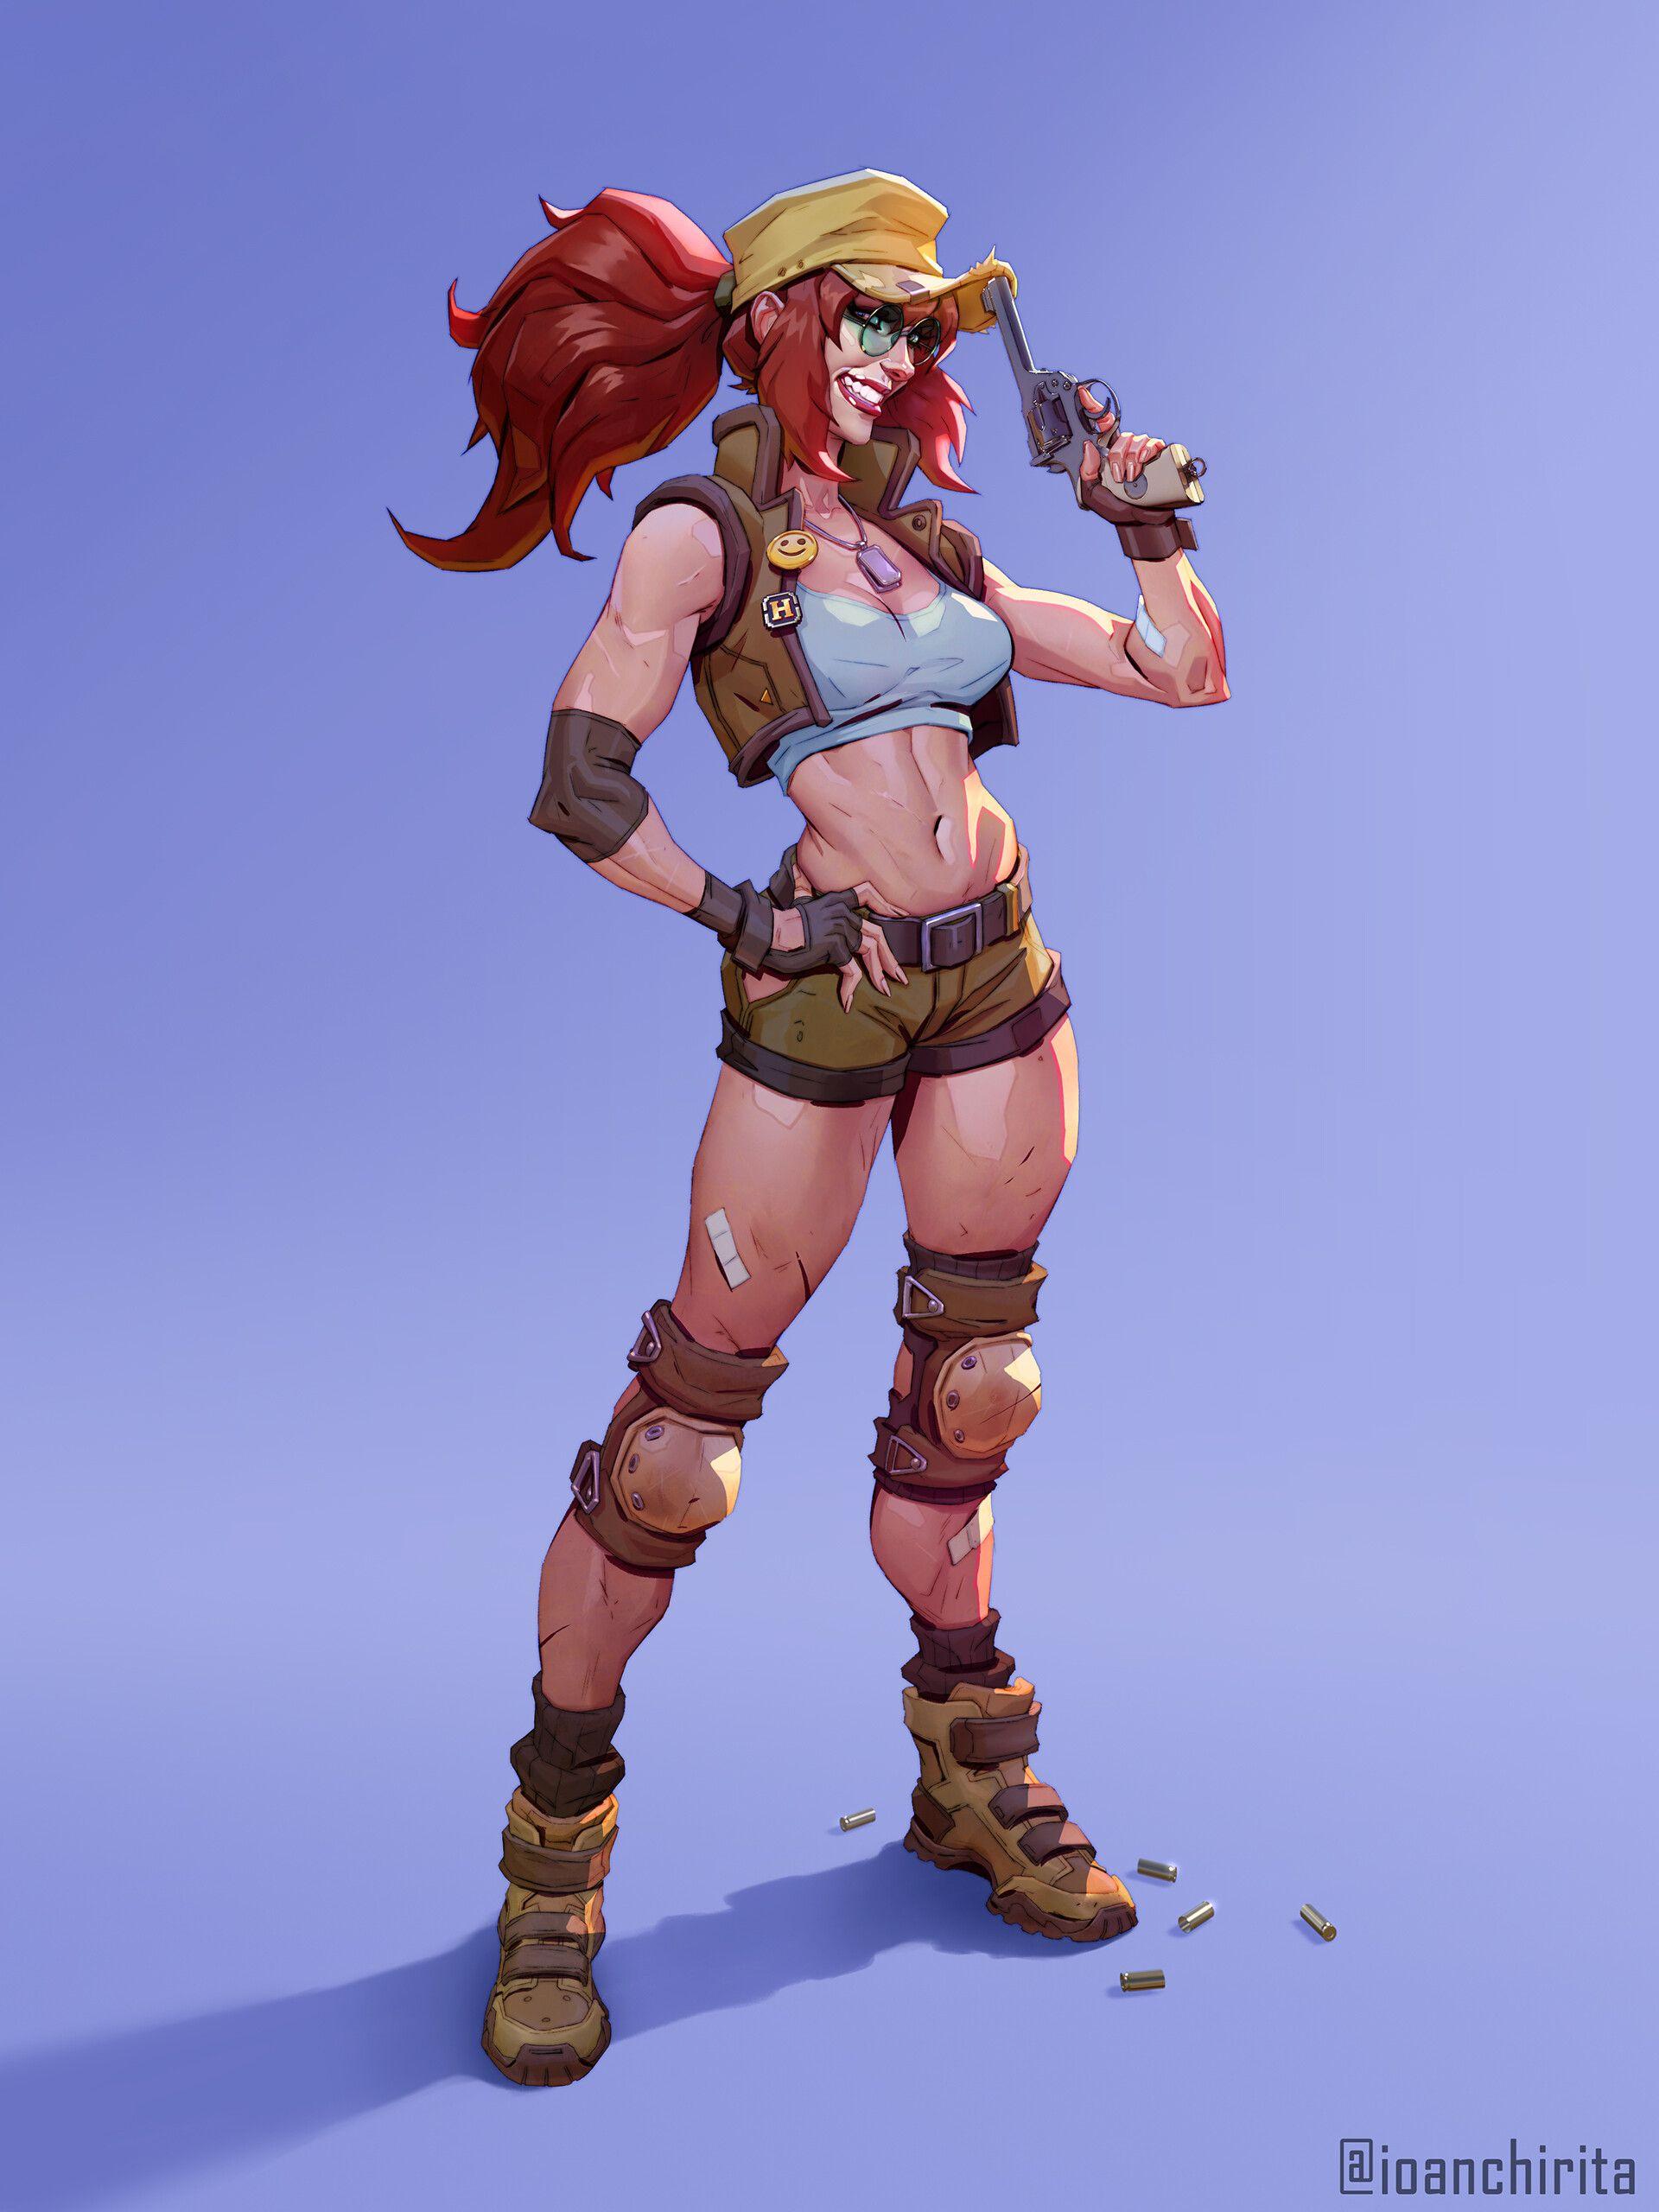 Artstation Fiolina Germi Ioan Chirita Concept Art Characters Anime Fantasy Character Design